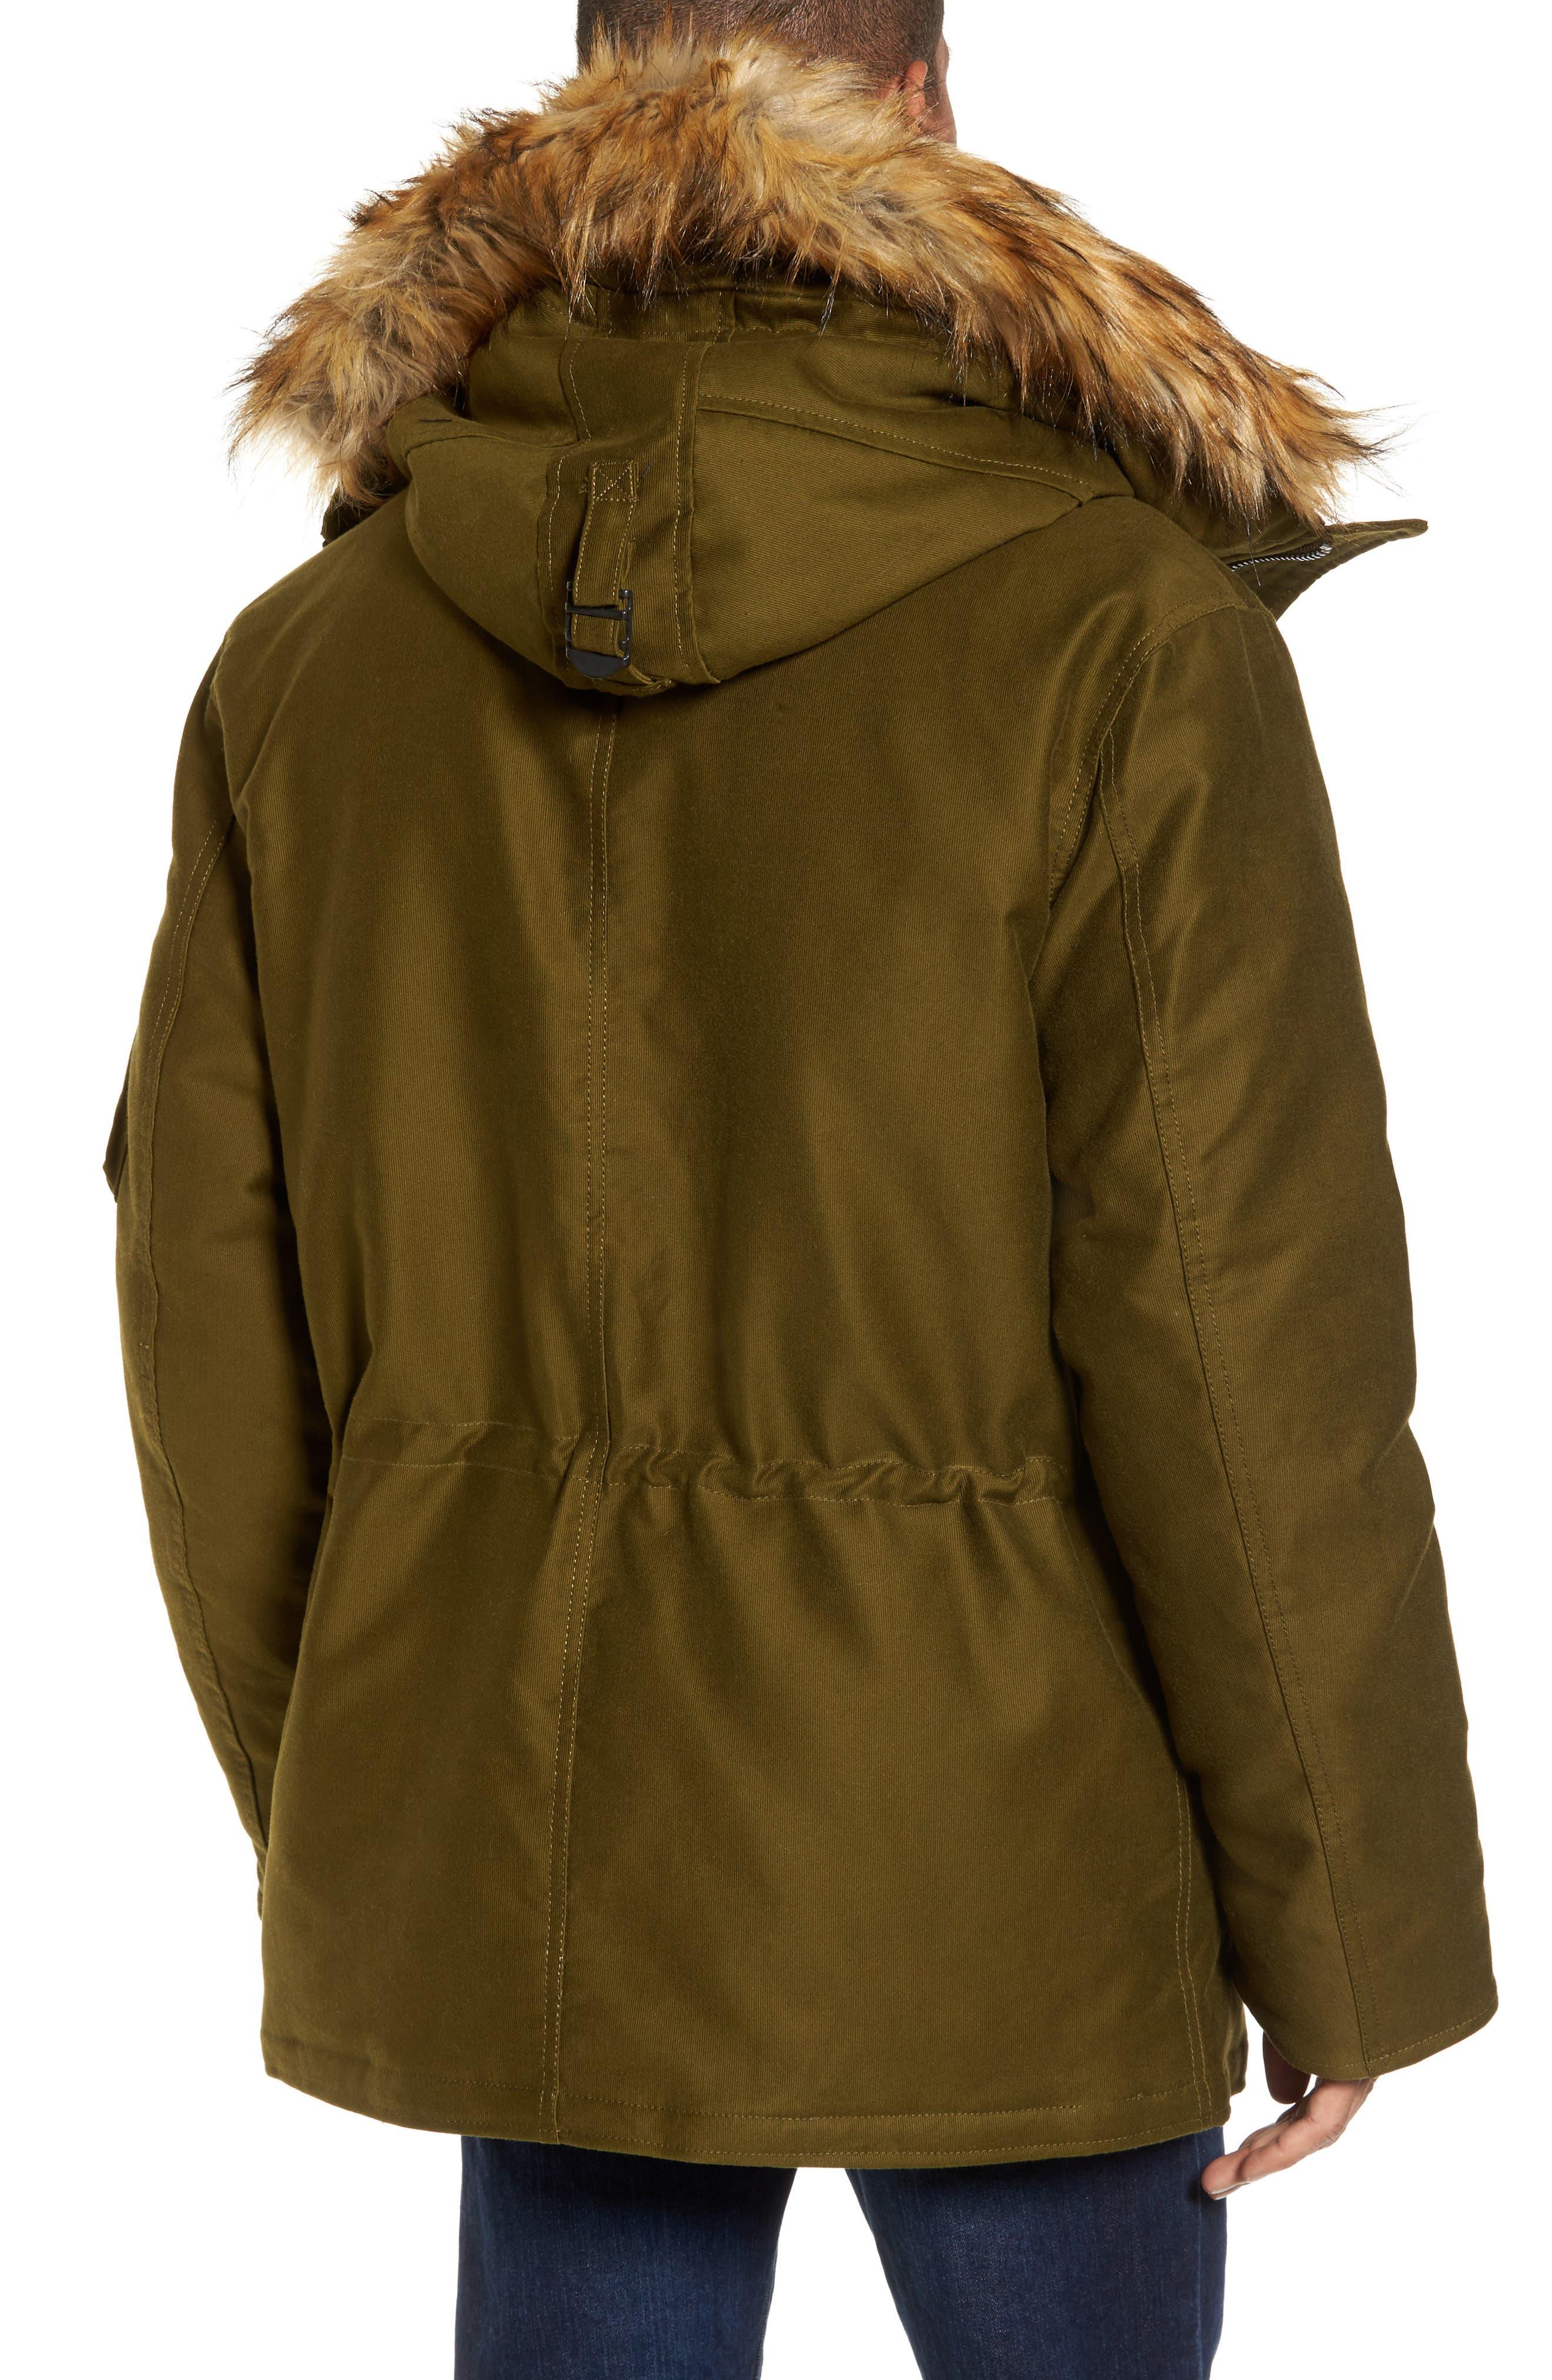 Bedford Corduroy Goose Down Jacket with Faux Fur Trim,                             Alternate thumbnail 2, color,                             352